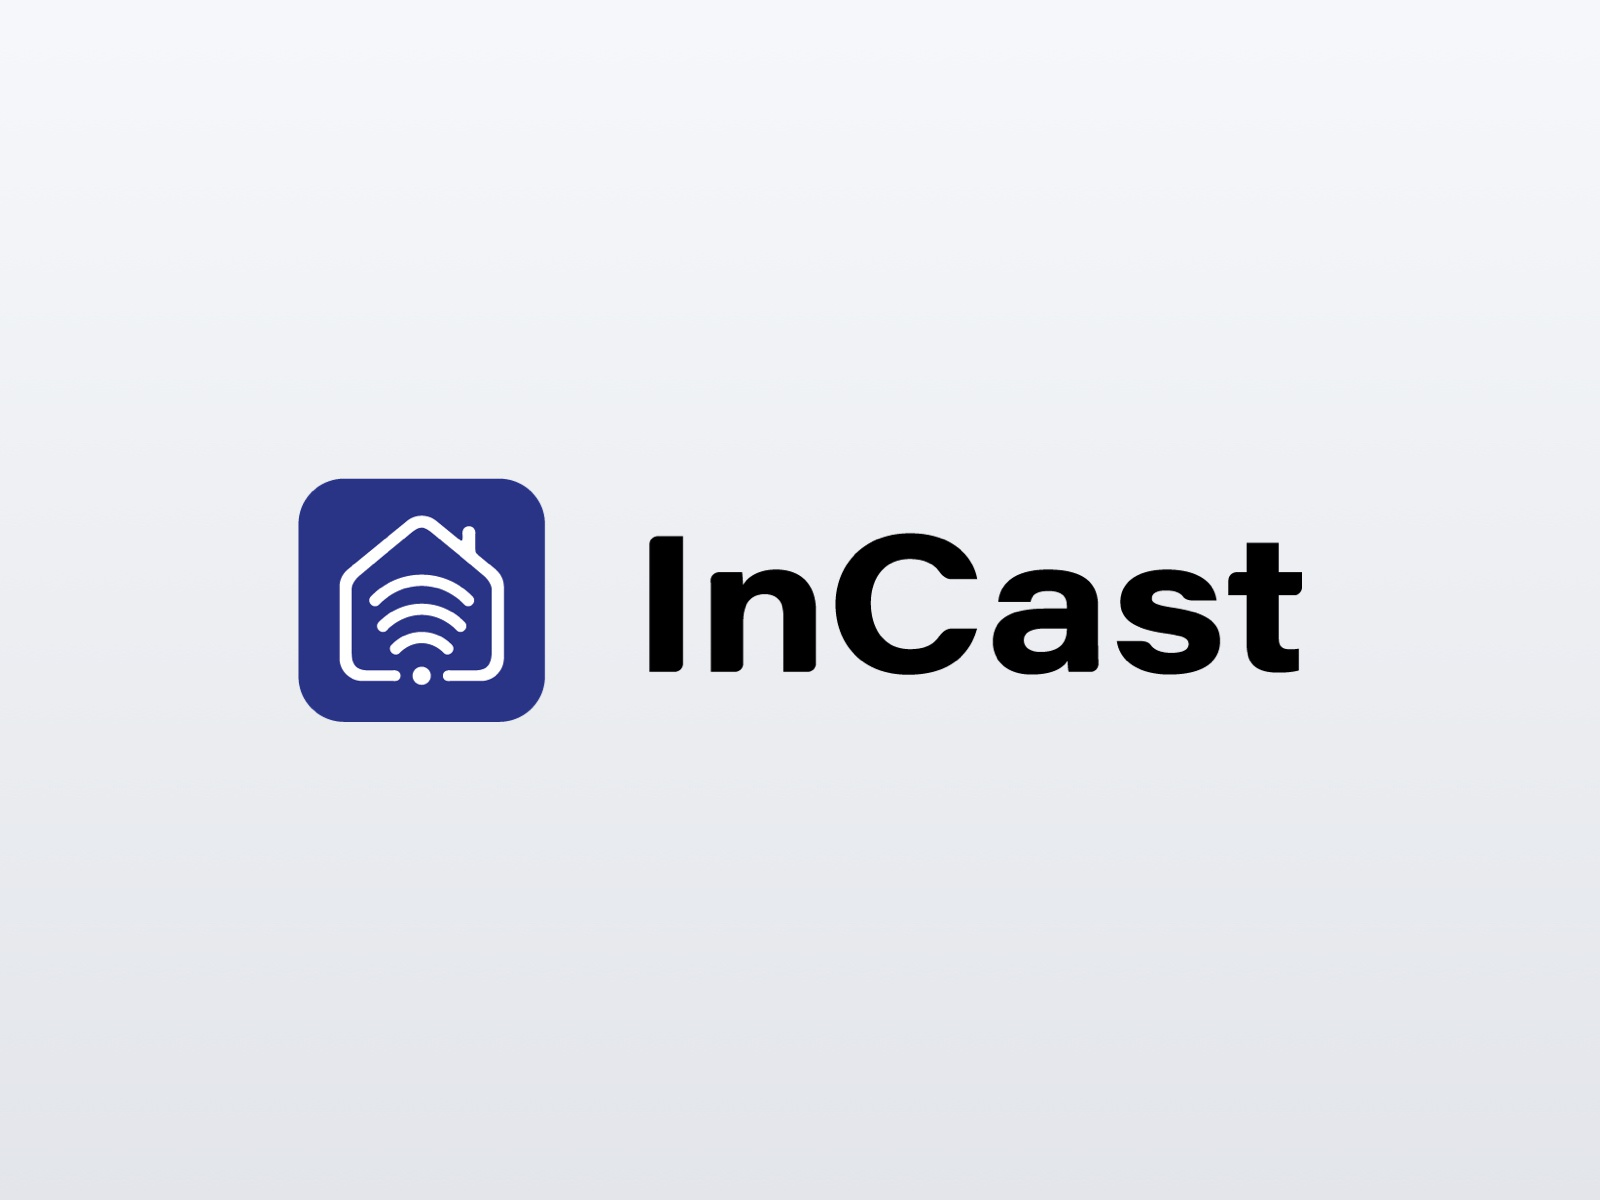 Incast